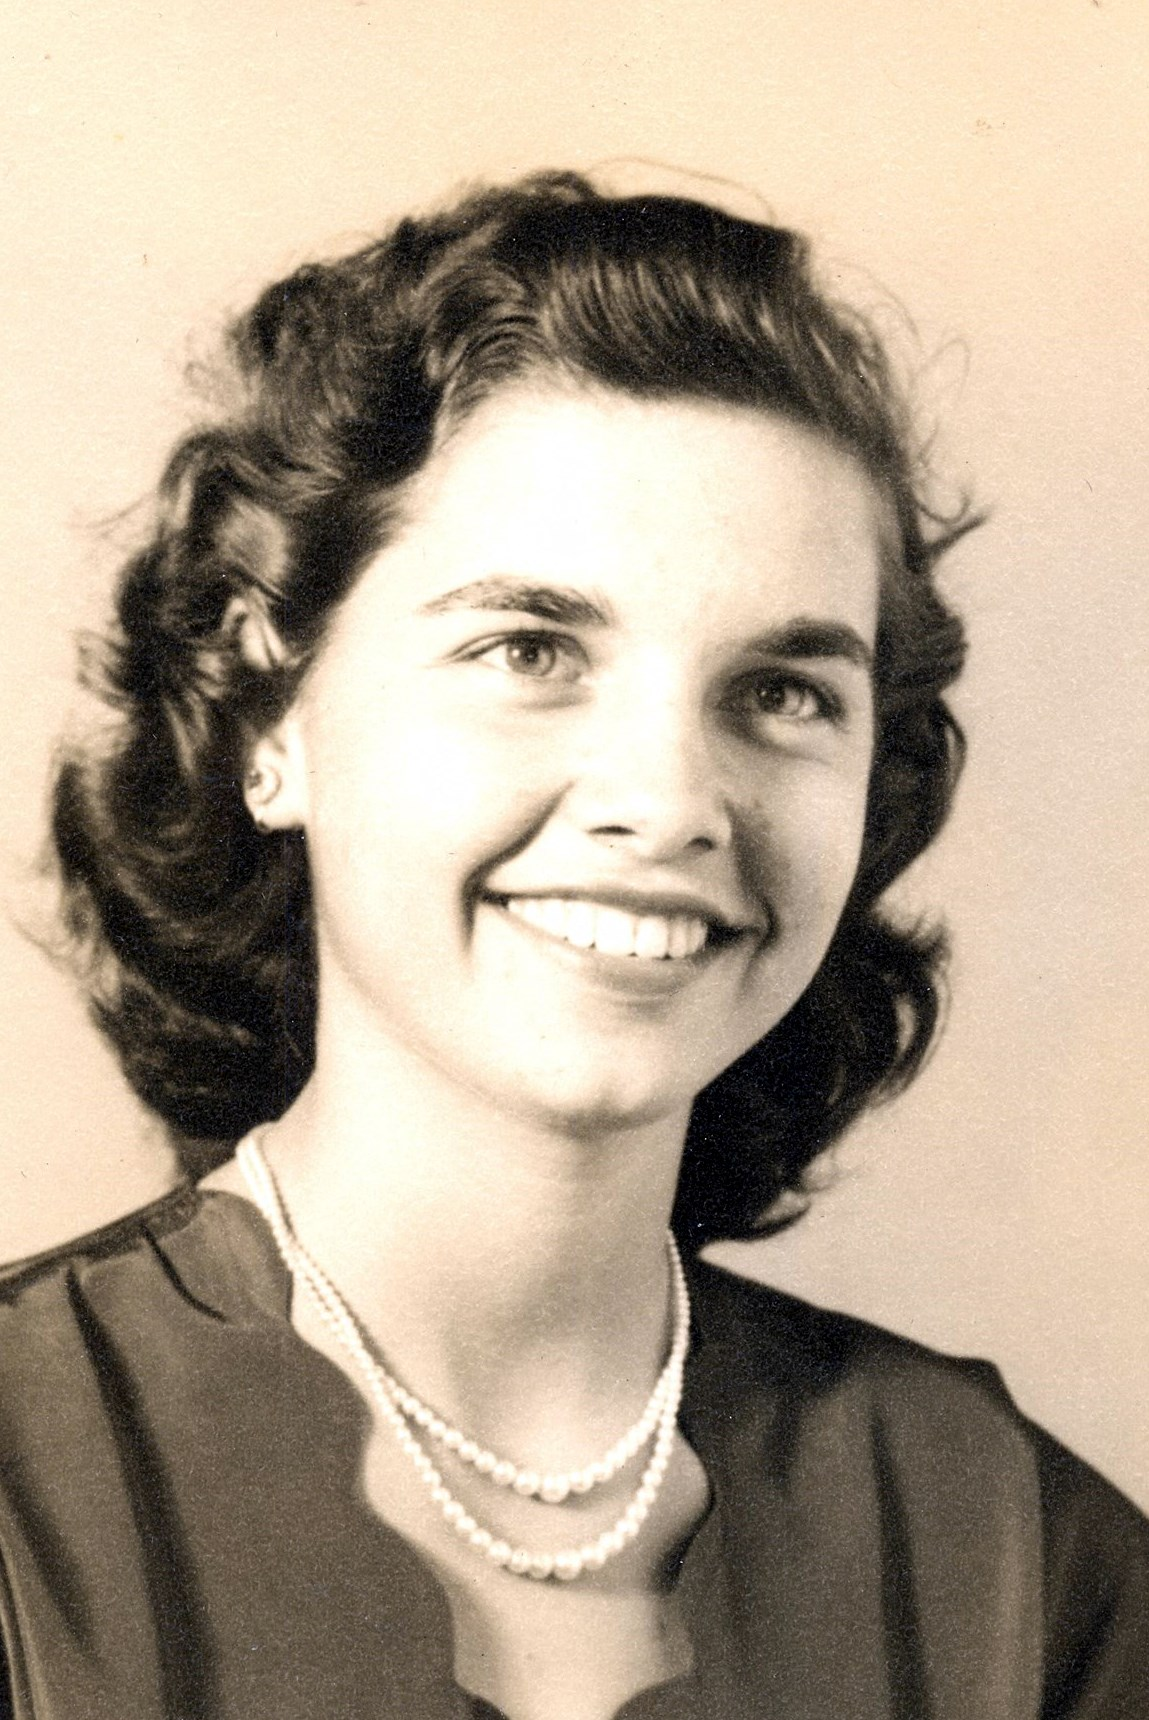 Arlene McCauley Obituary - New Braunfels, TX